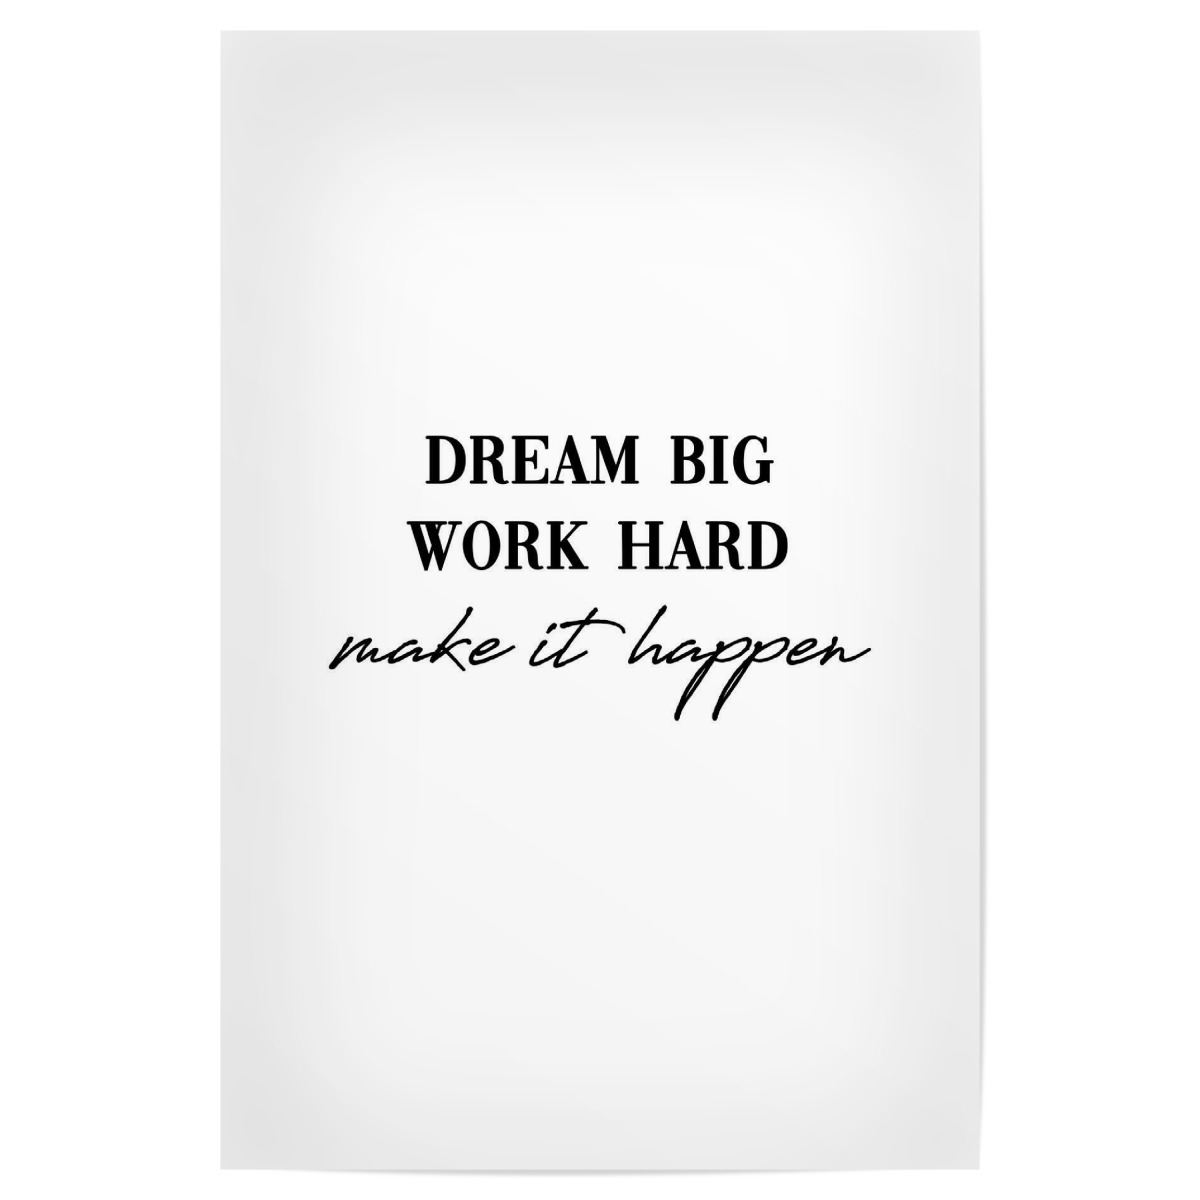 dream big work hard 30x20 cm poster